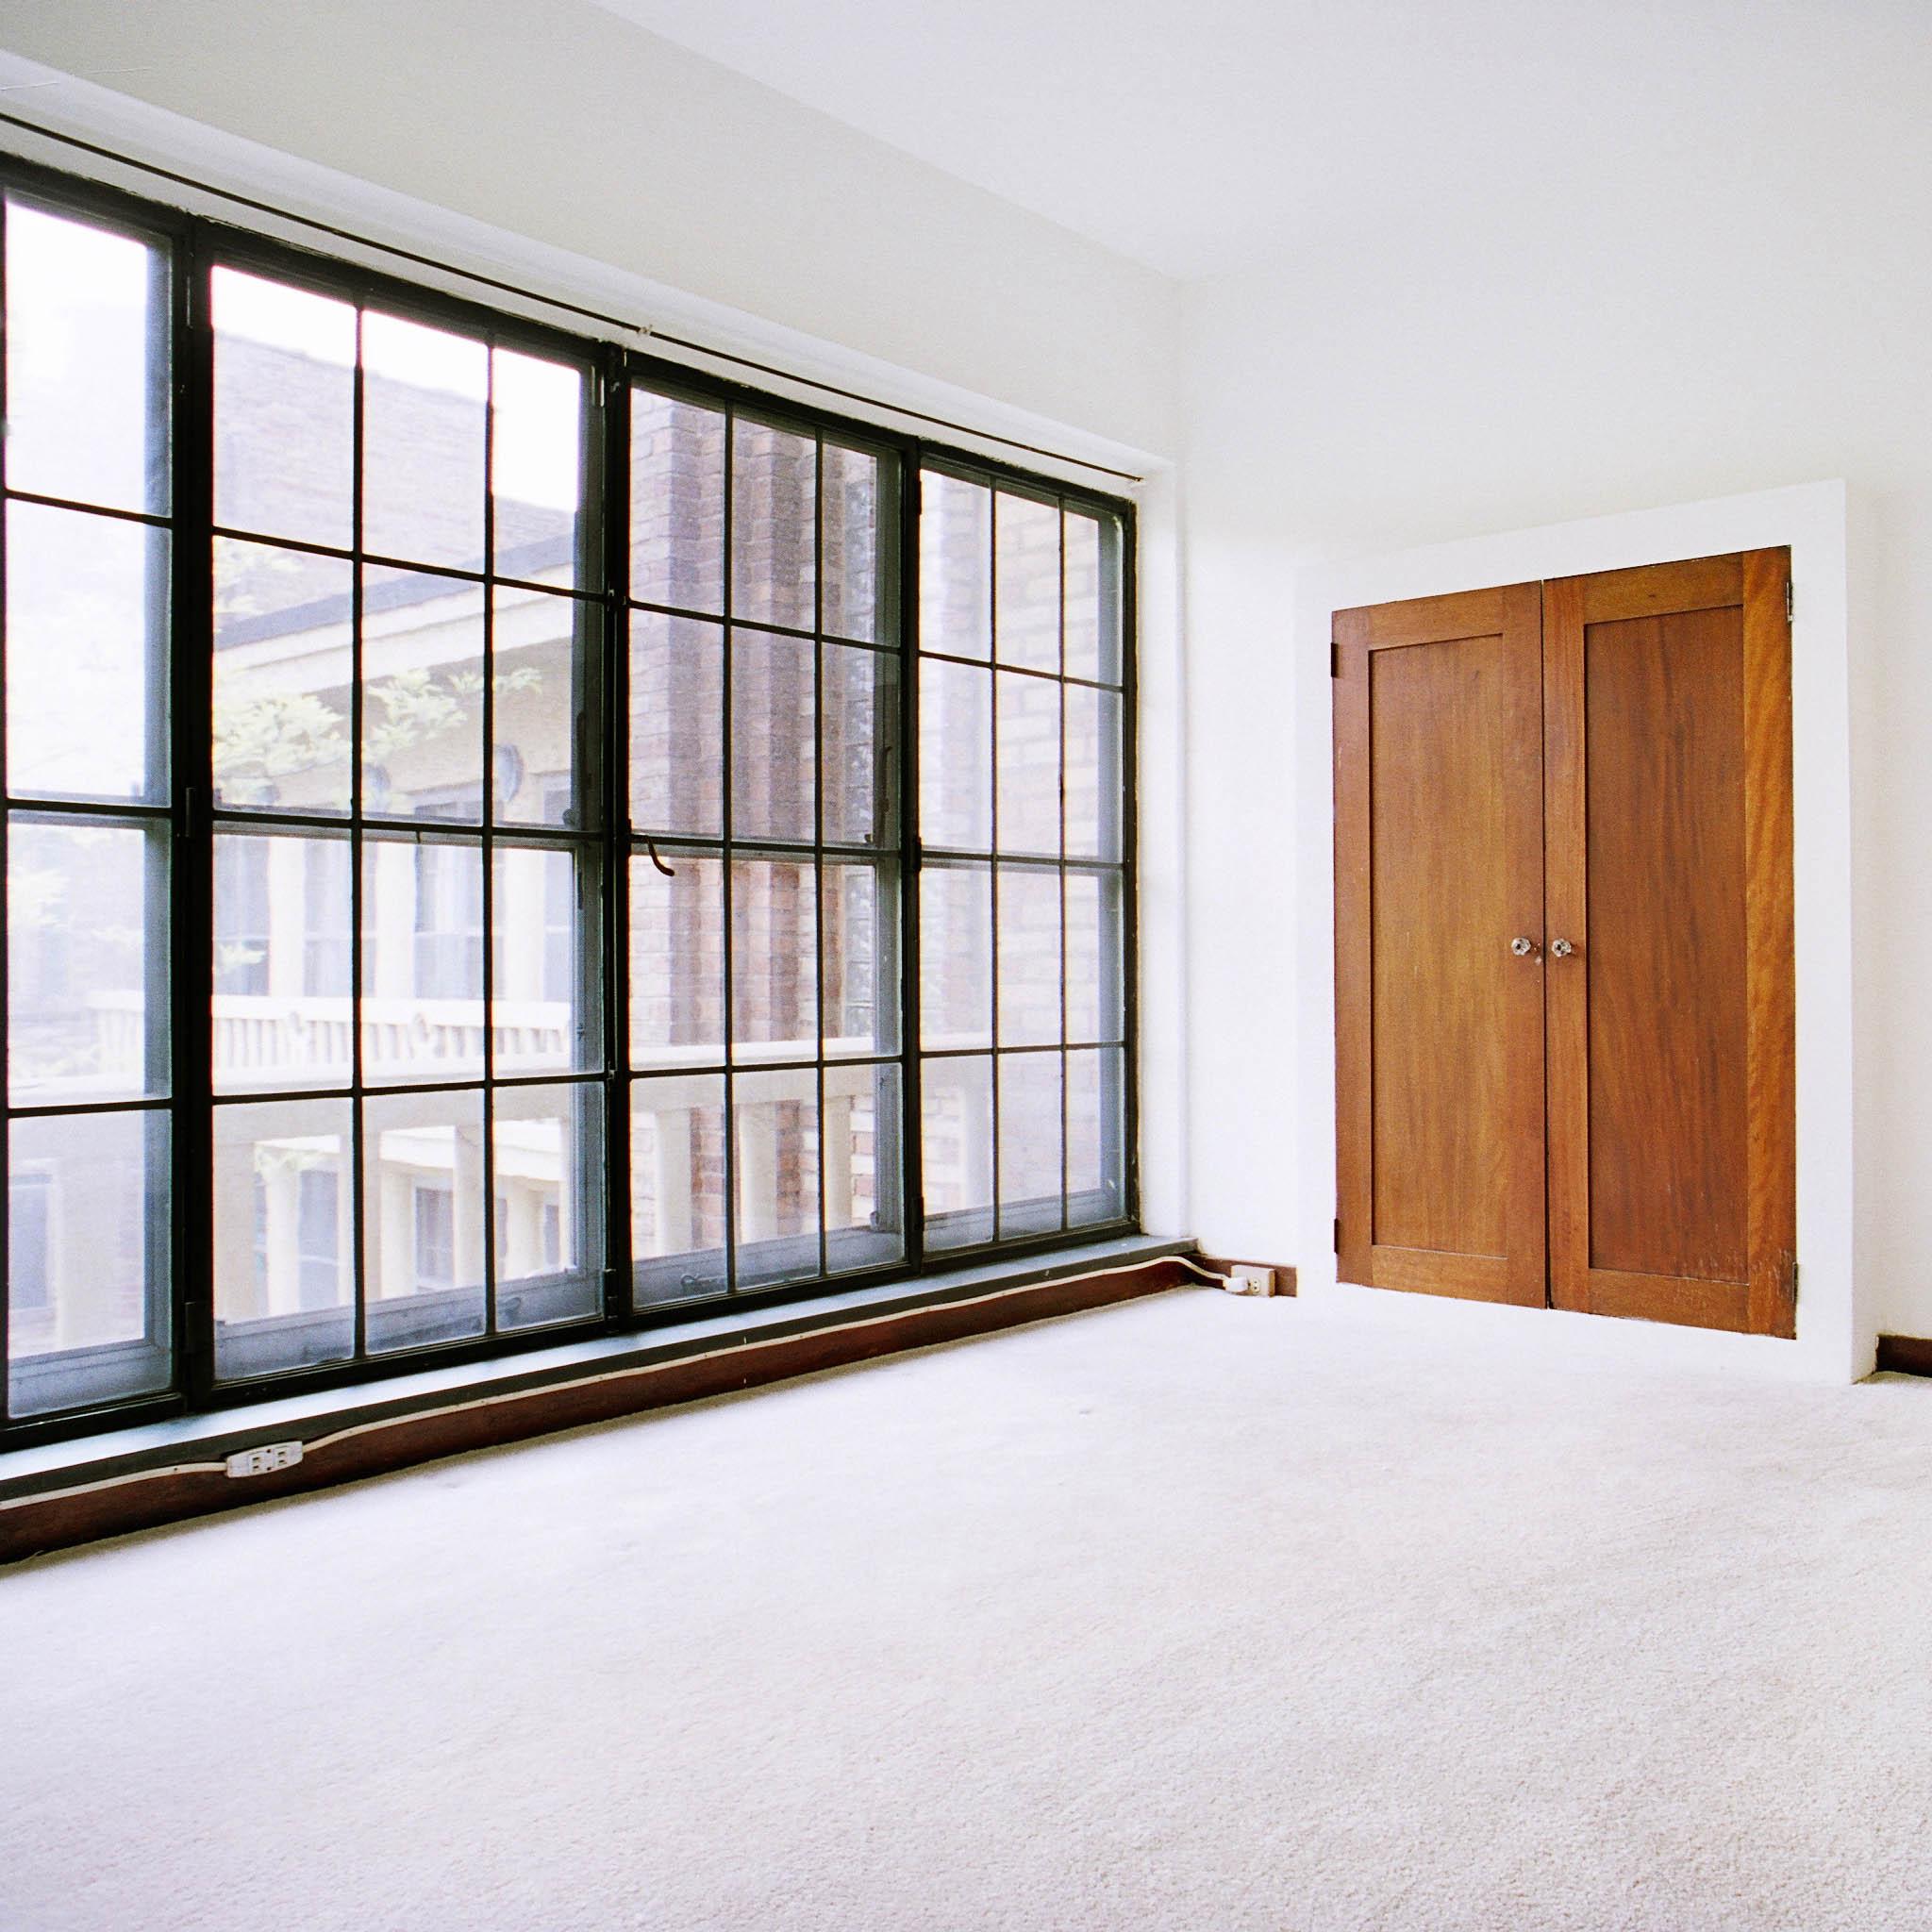 interior of 340 S. Highland Ave, Apt. 7A 8